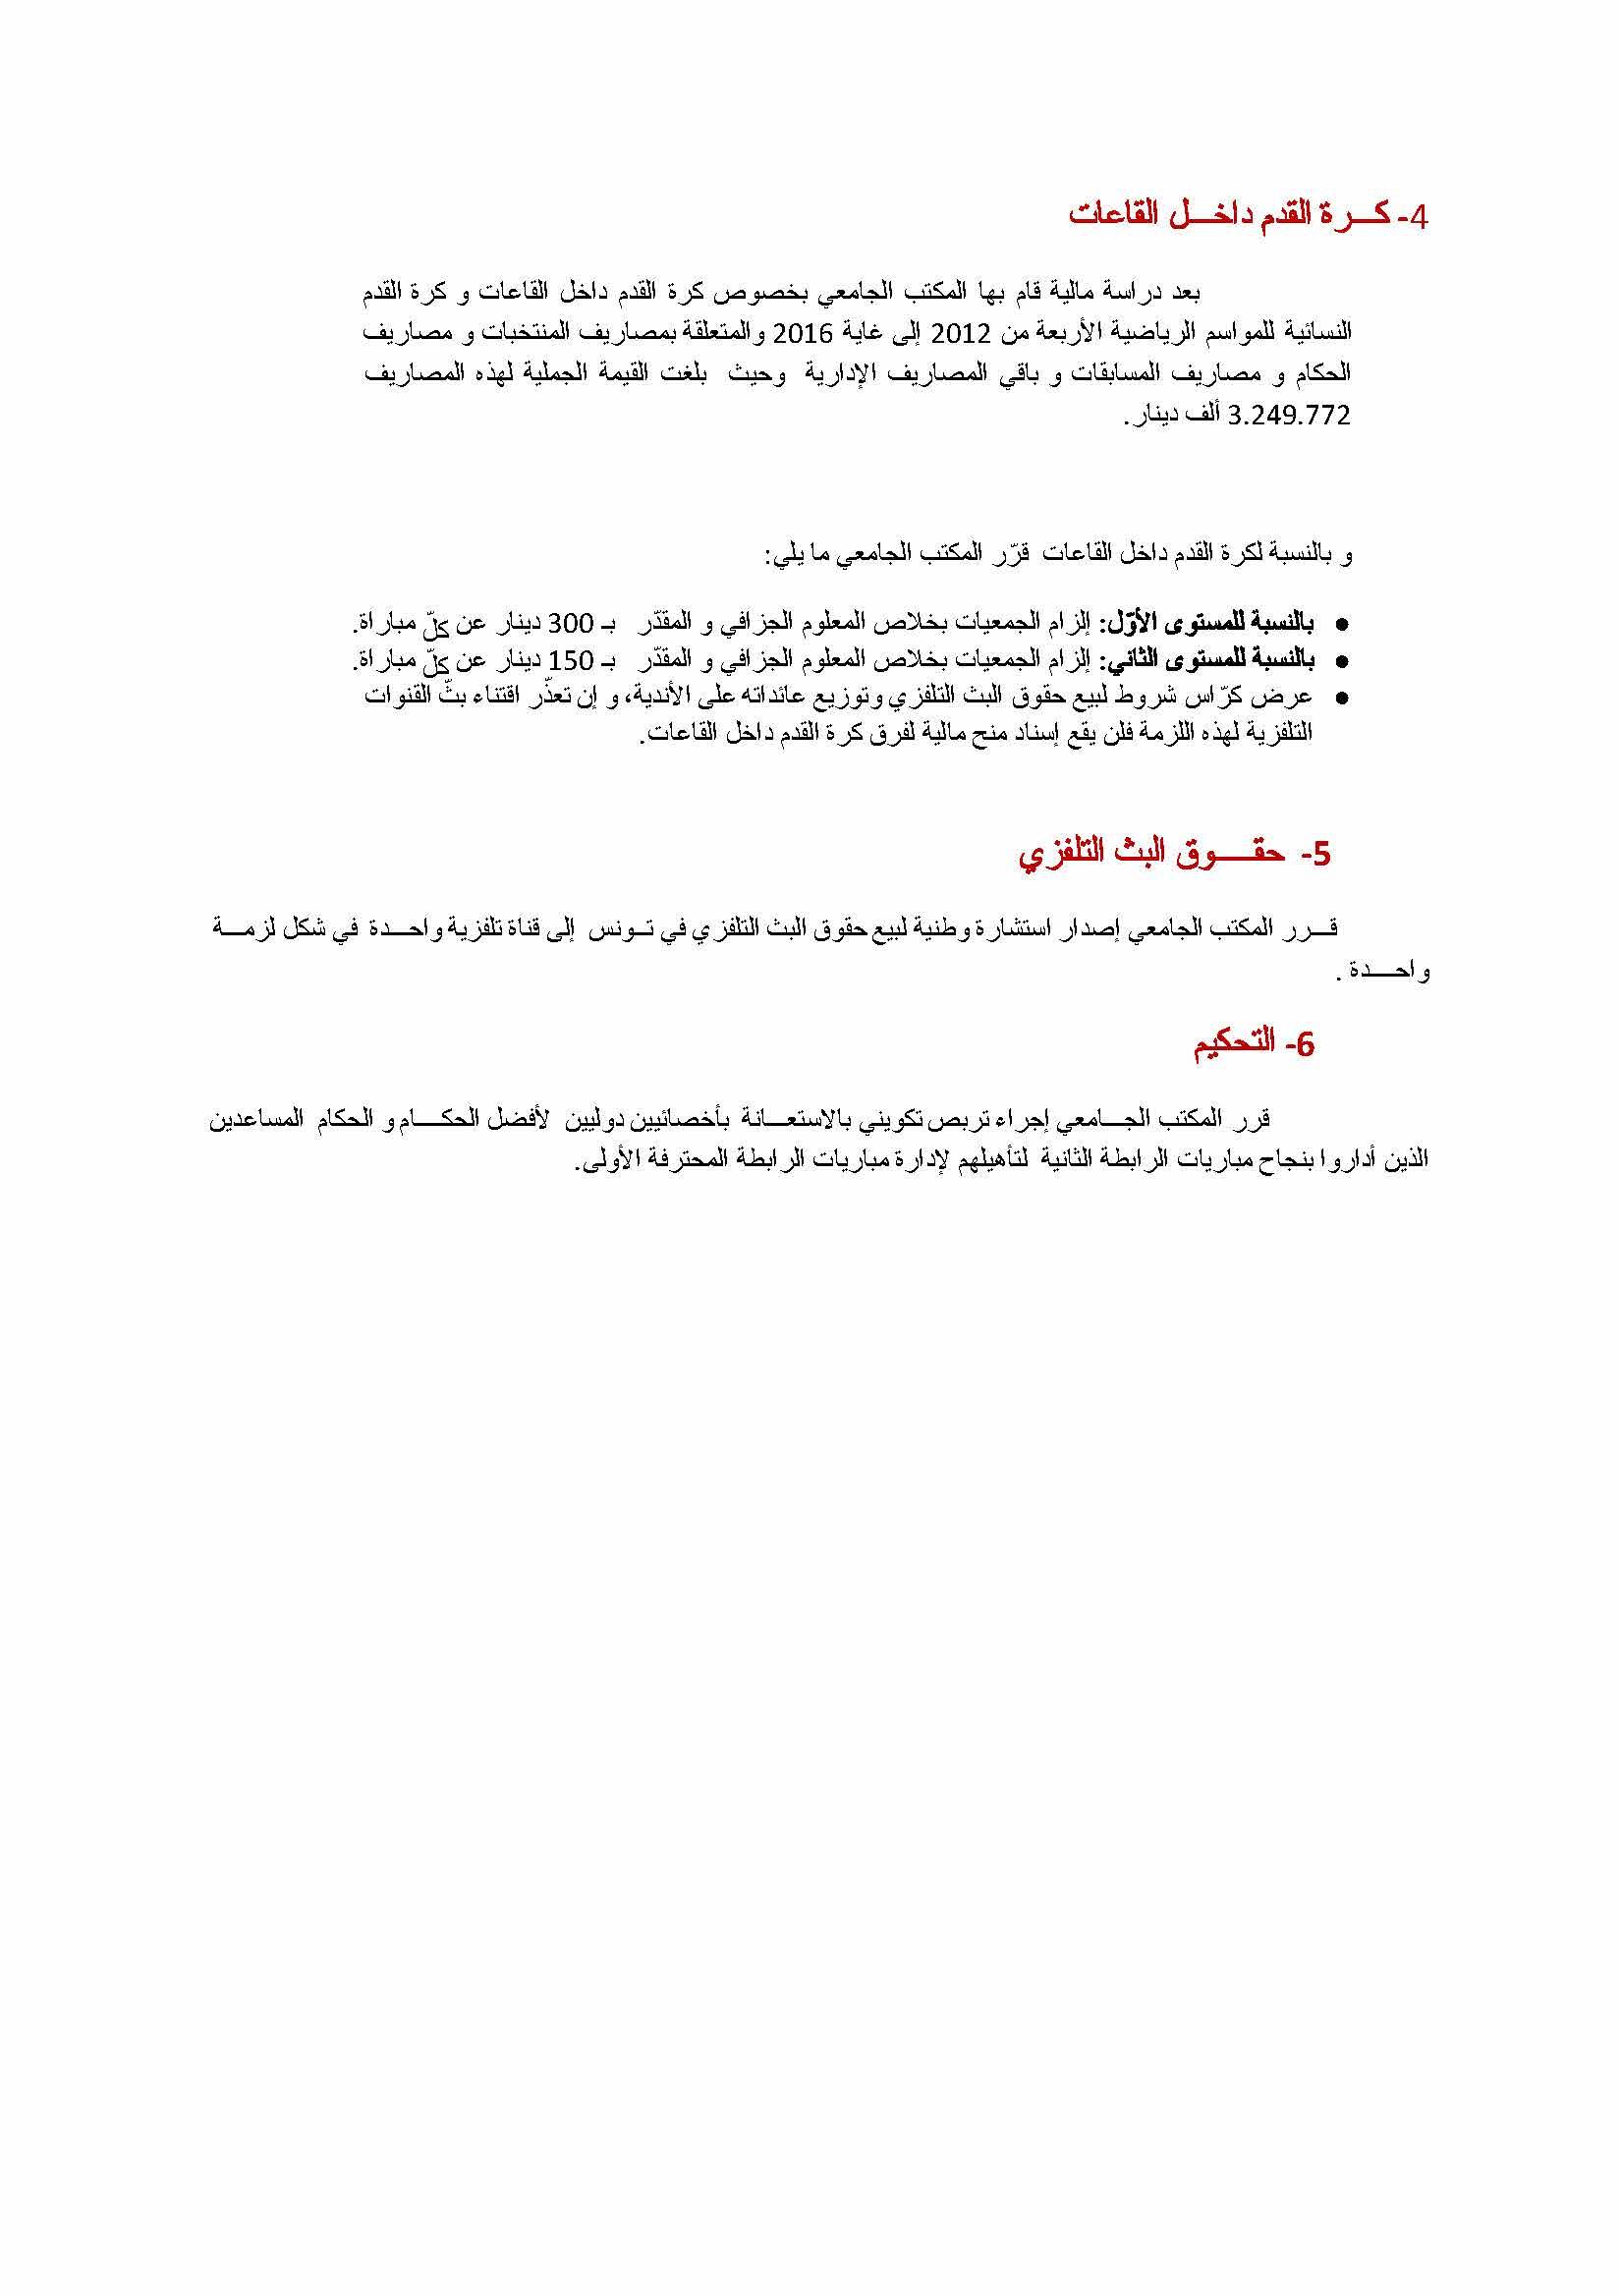 compterenduBF15-06-2016.docx_Page_2